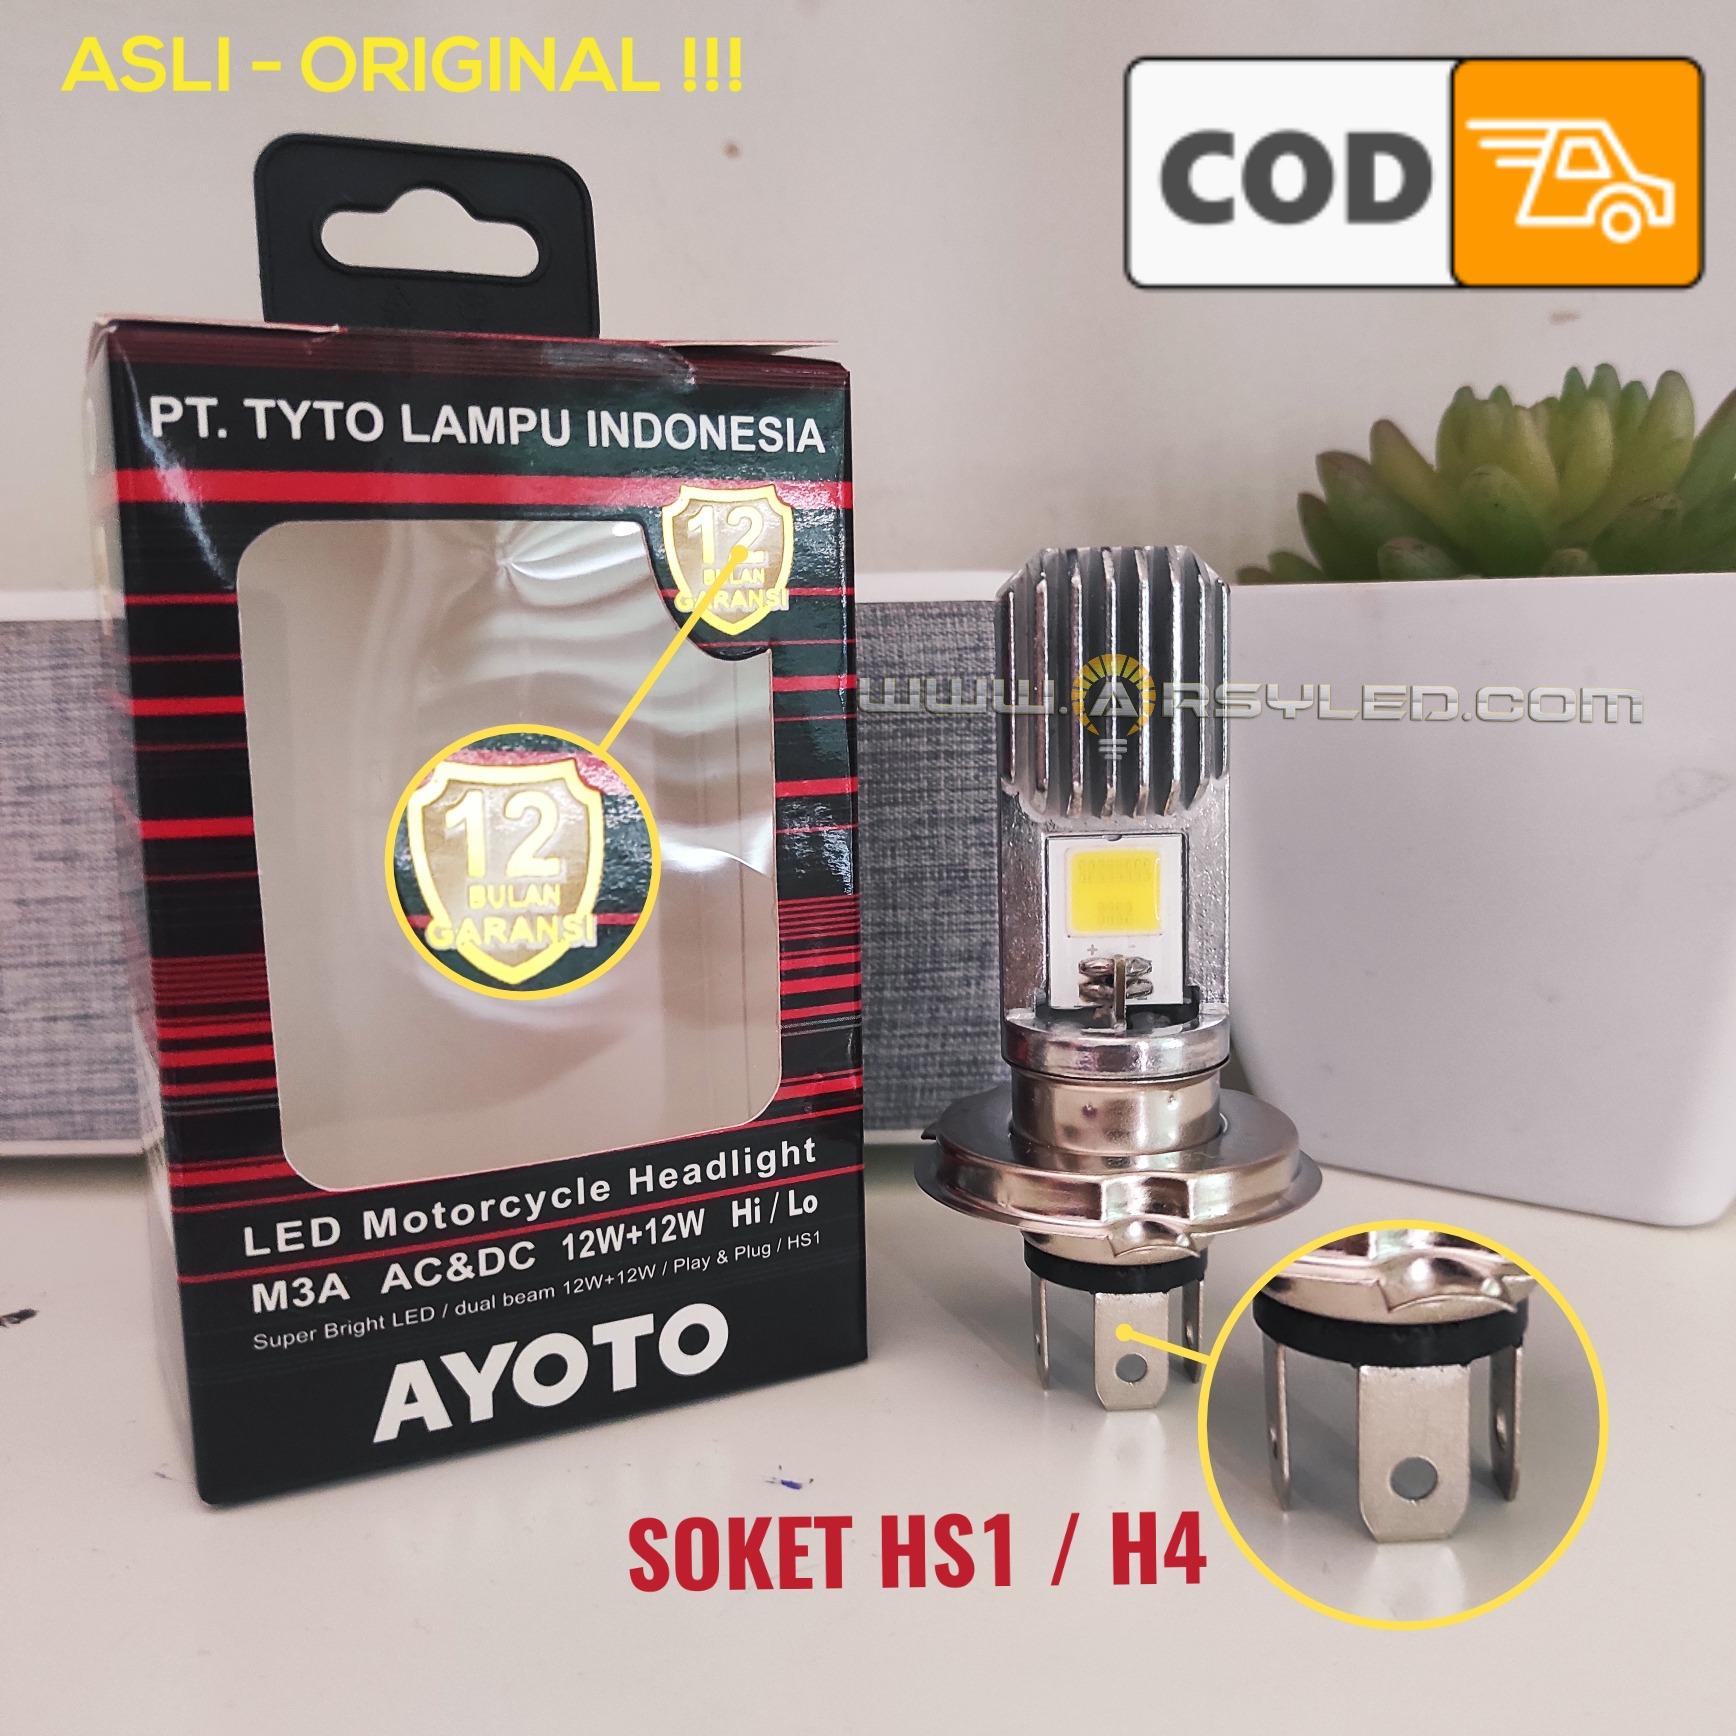 1 Buah Lampu Utama Motor LED Motor Bebek Matic H4 HS1 Hi Lo VIXION BYSON CB150R SCOOPY FI MX KING VERZA TYTO AYOTO ASLI M3A AC DC PNP - Putih